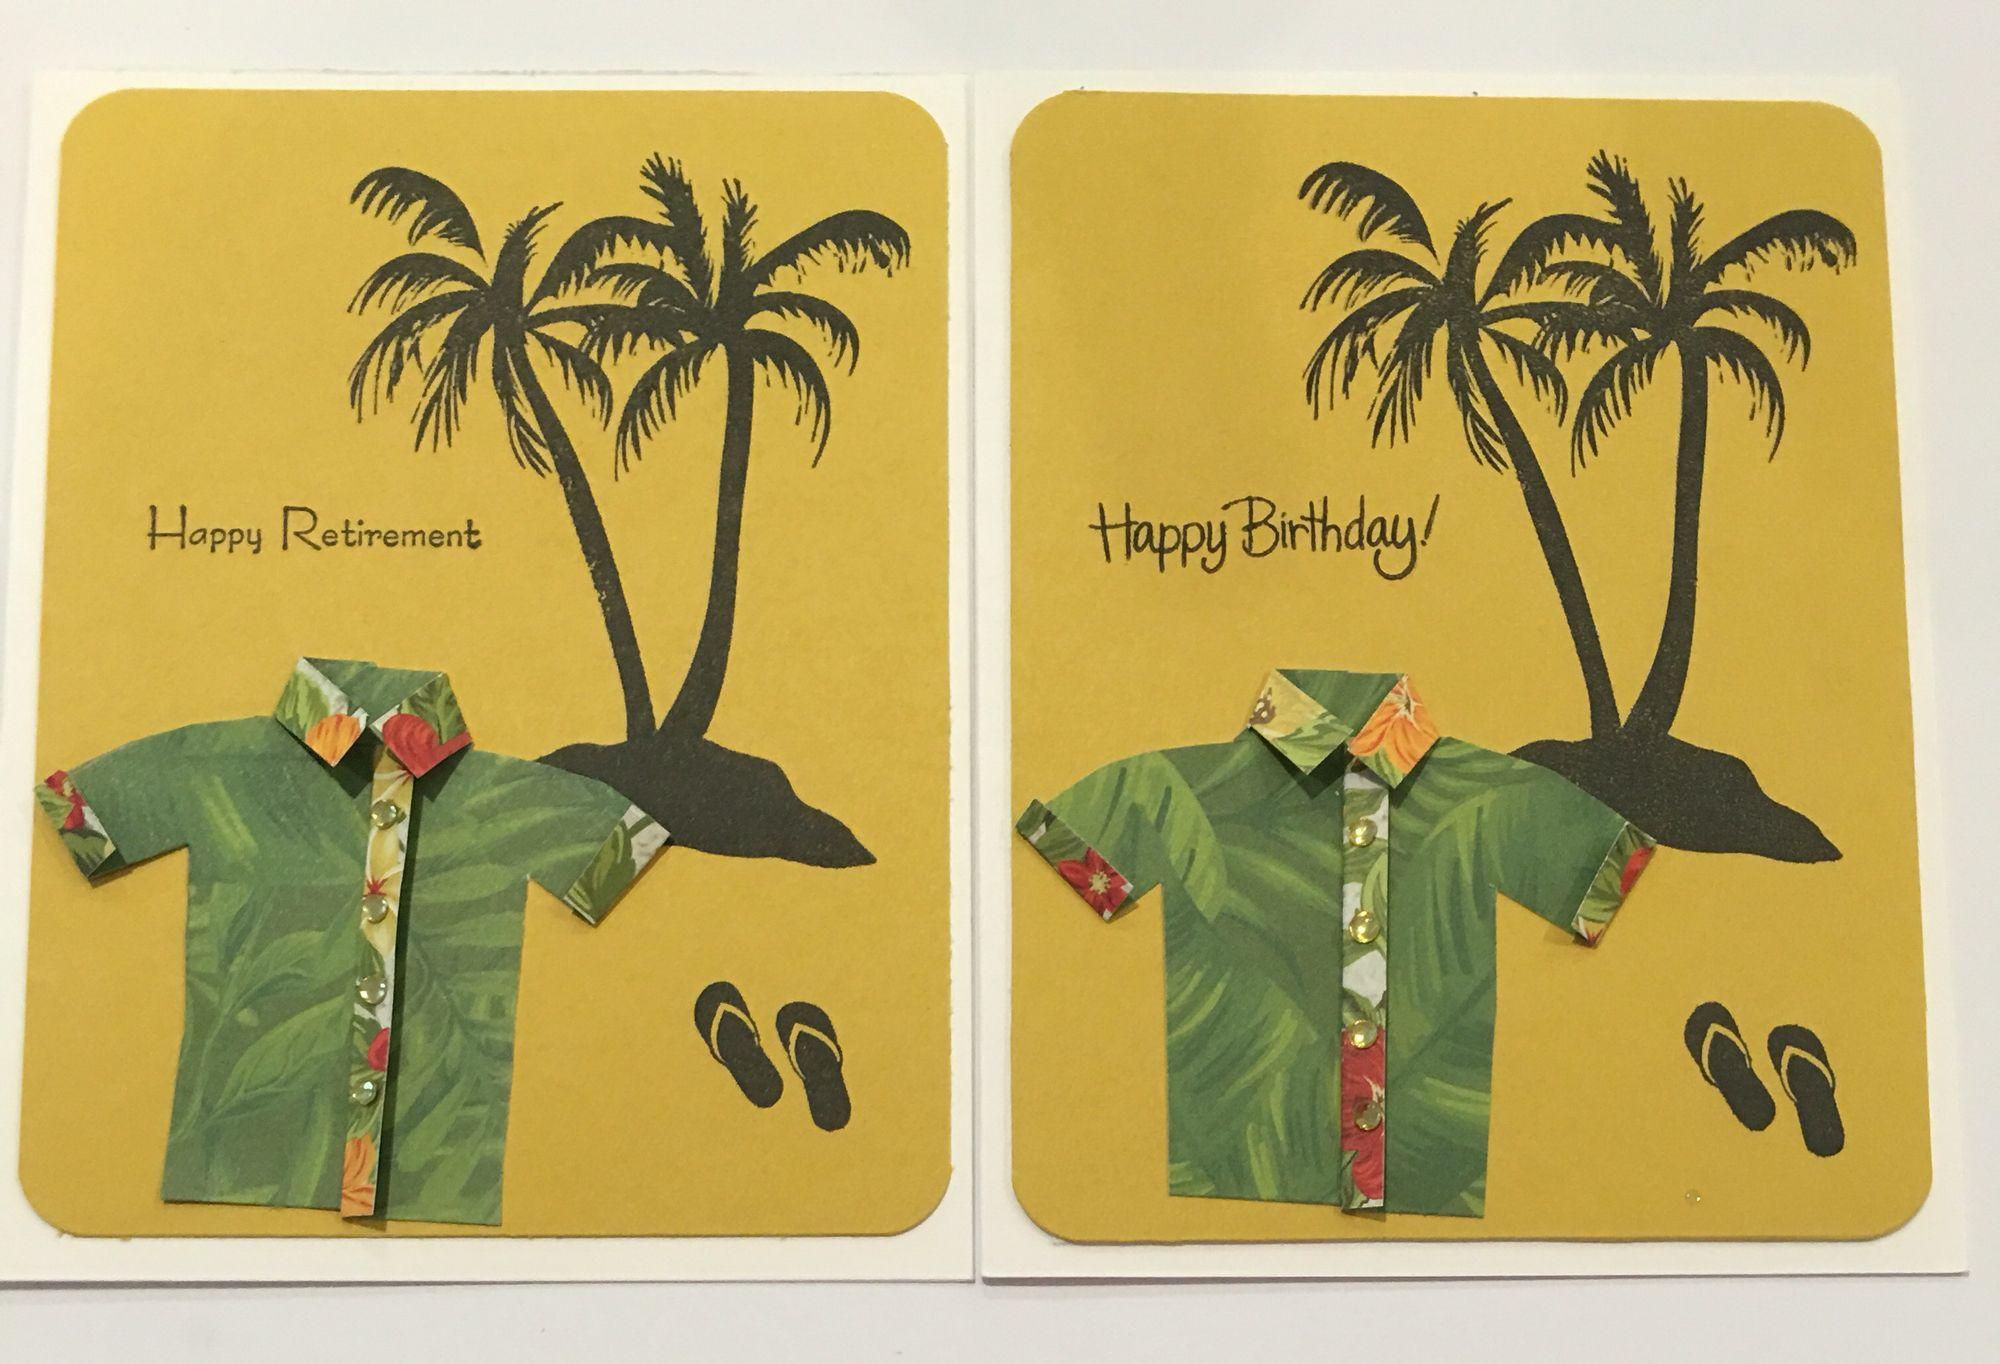 Cby happy birthday and happy retirement greeting cards with palm cby happy birthday and happy retirement greeting cards with palm tree flip flops and m4hsunfo